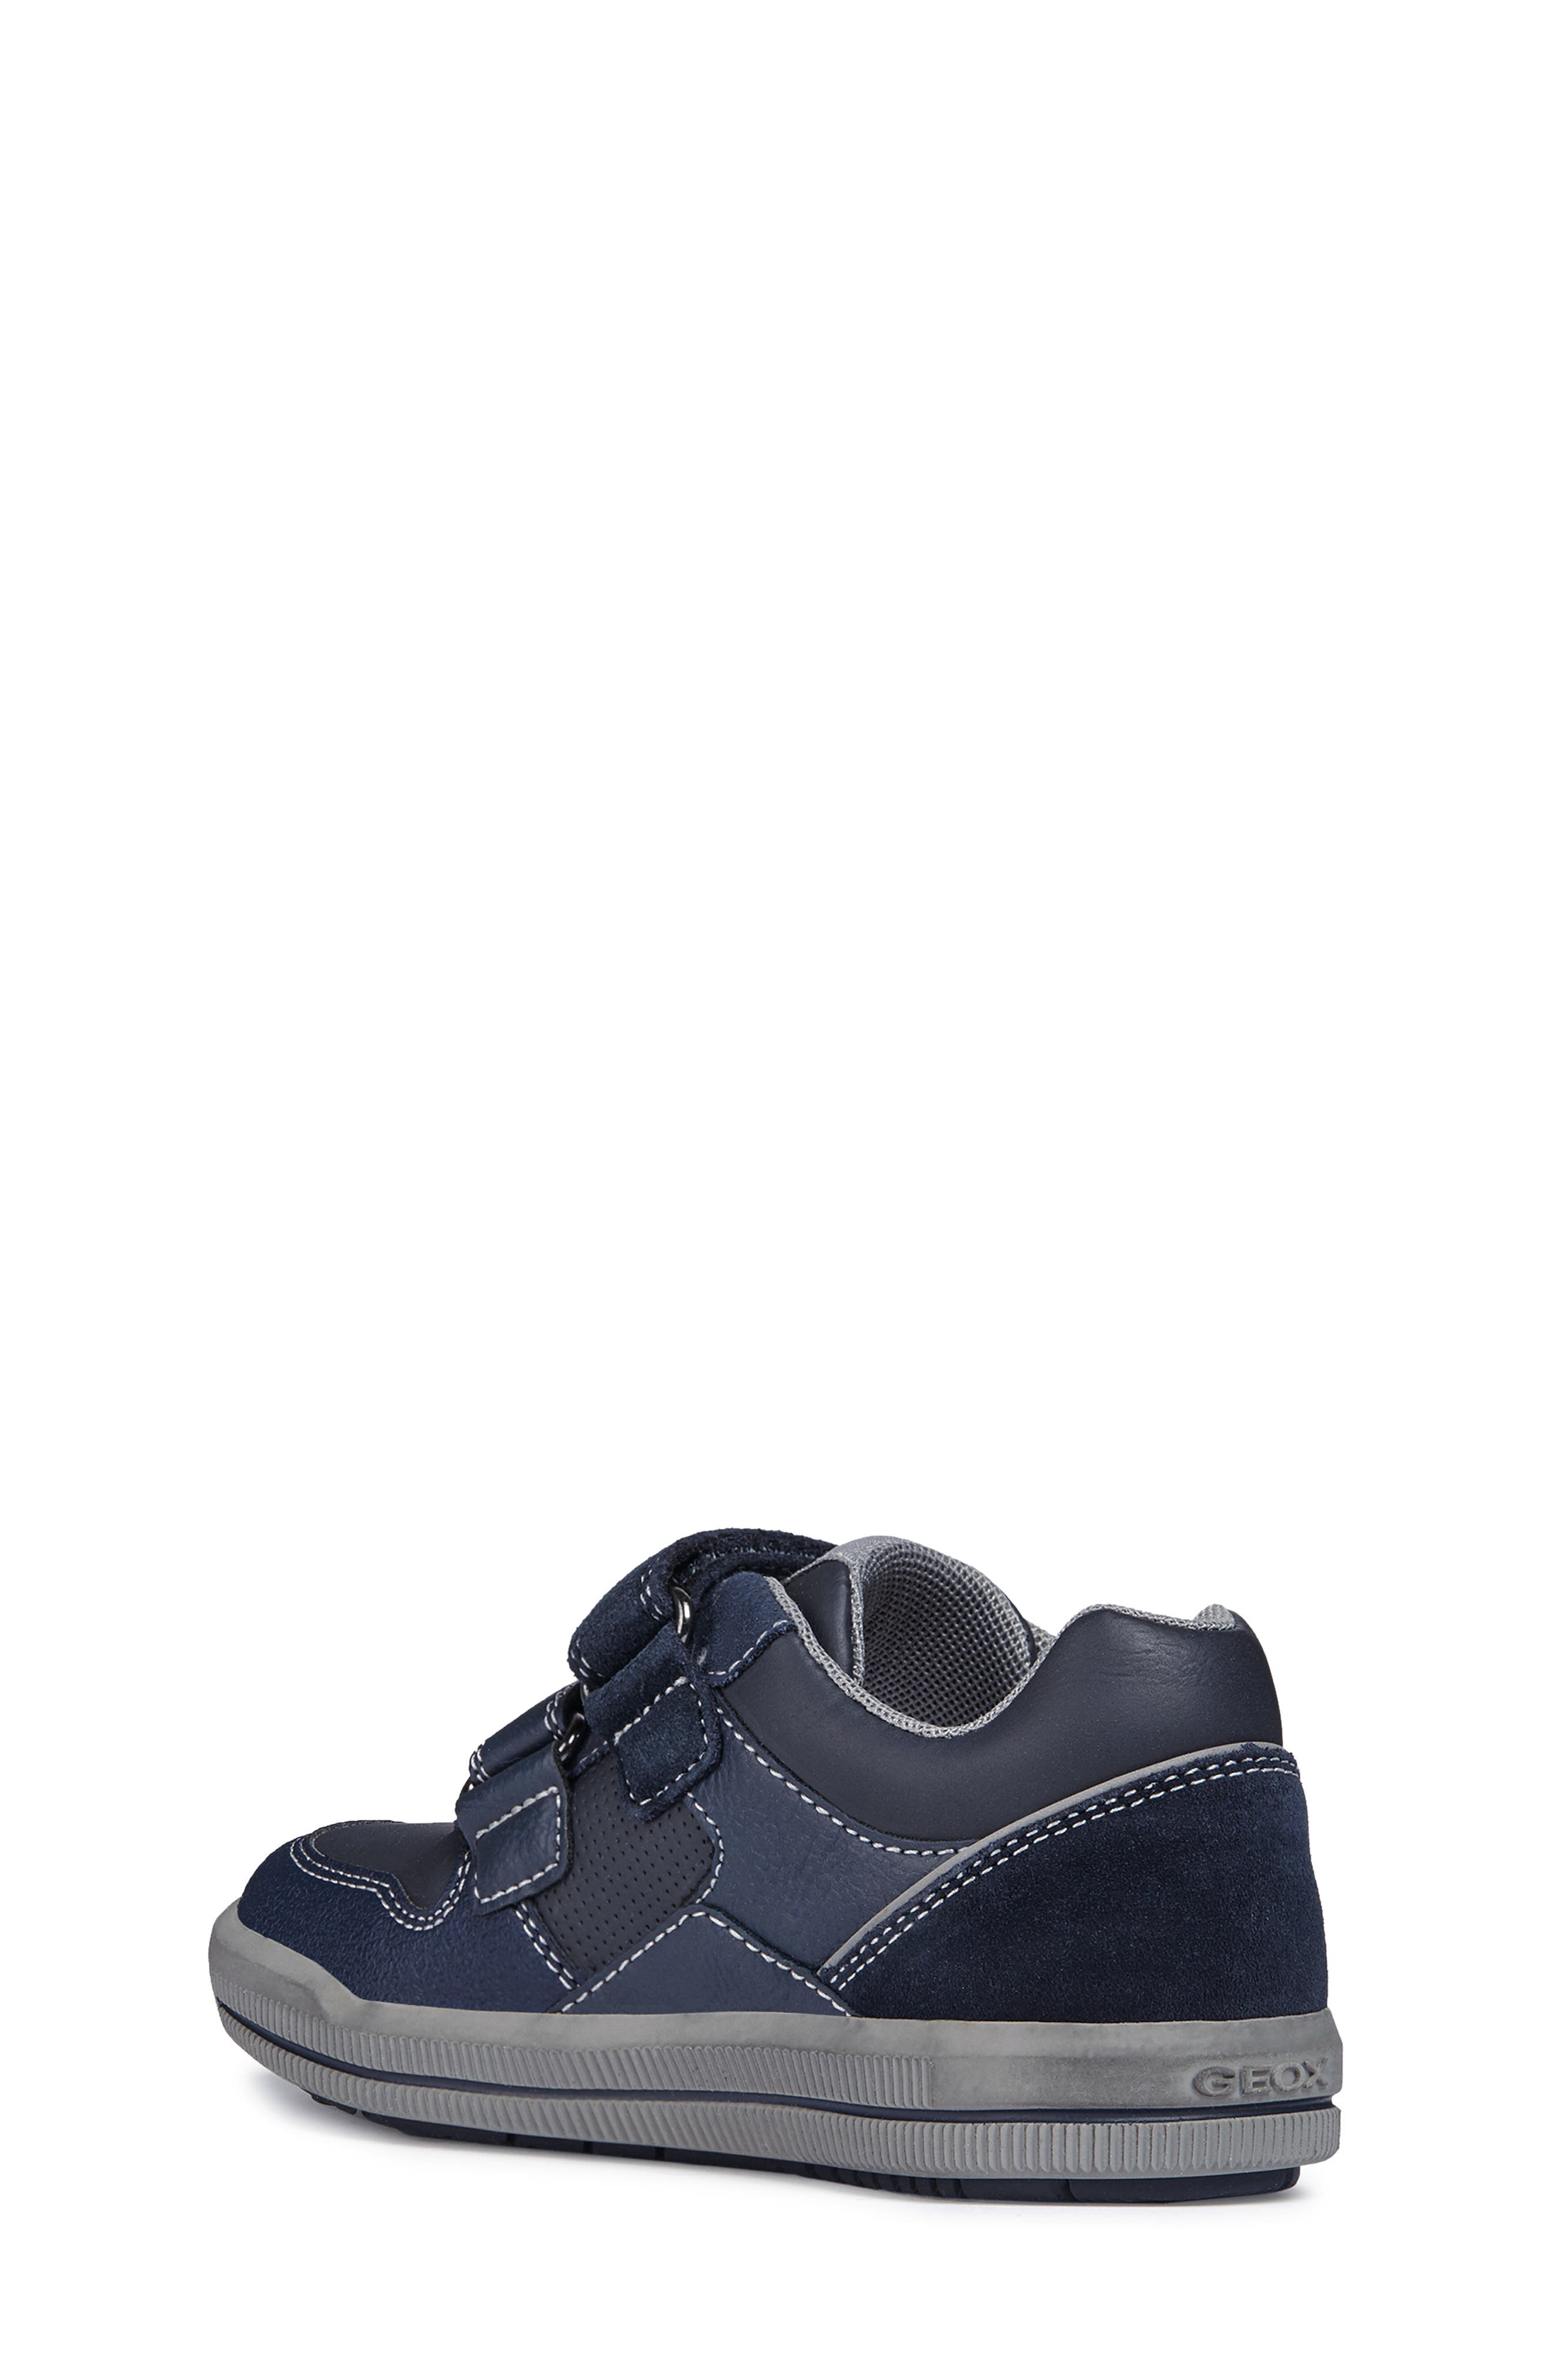 Jr Arzach Sneaker,                             Alternate thumbnail 2, color,                             Navy Blue/ Grey